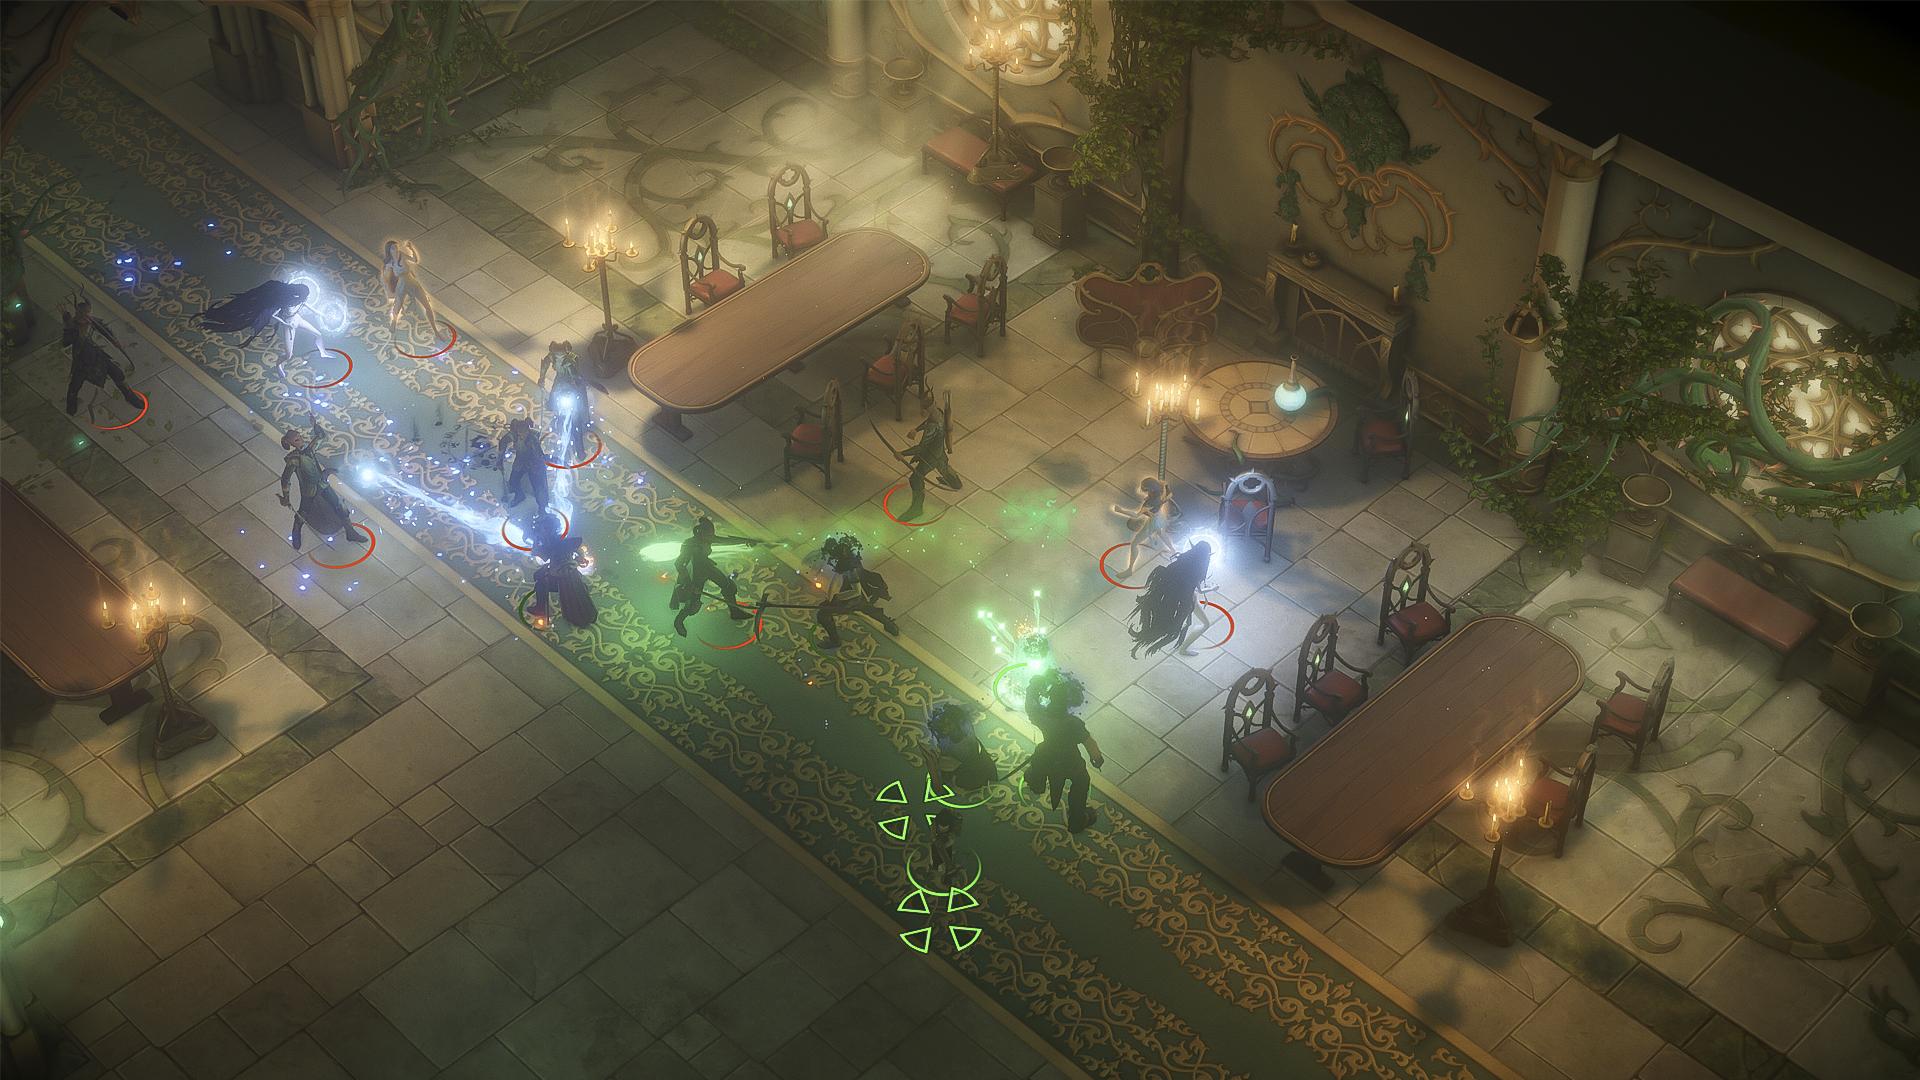 pathfinder kingmaker patch 1.0.4 download